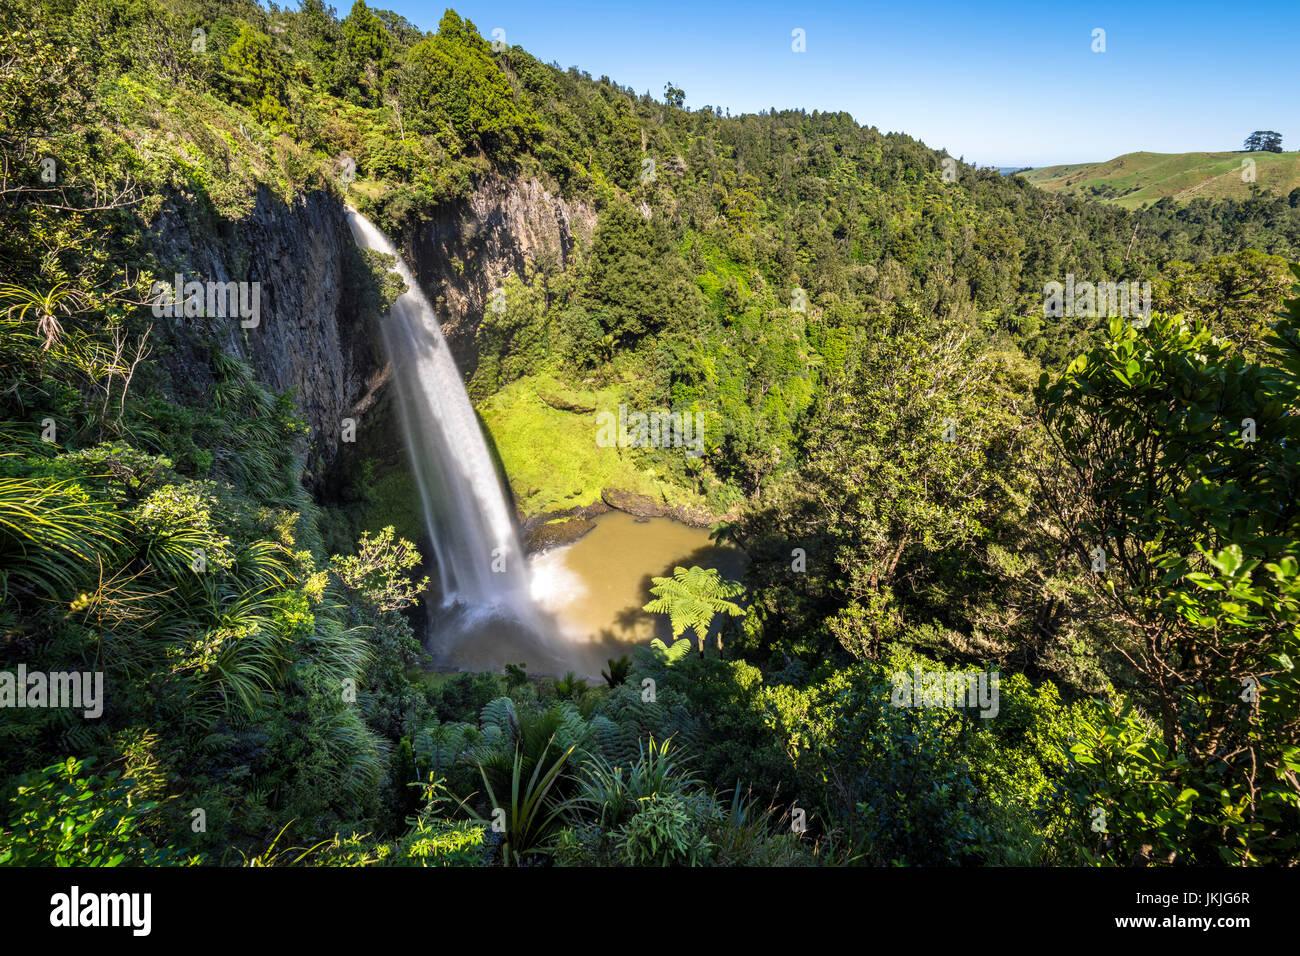 Neuseeland, Nordinsel, Raglan, Bridal Veil Falls Stockbild